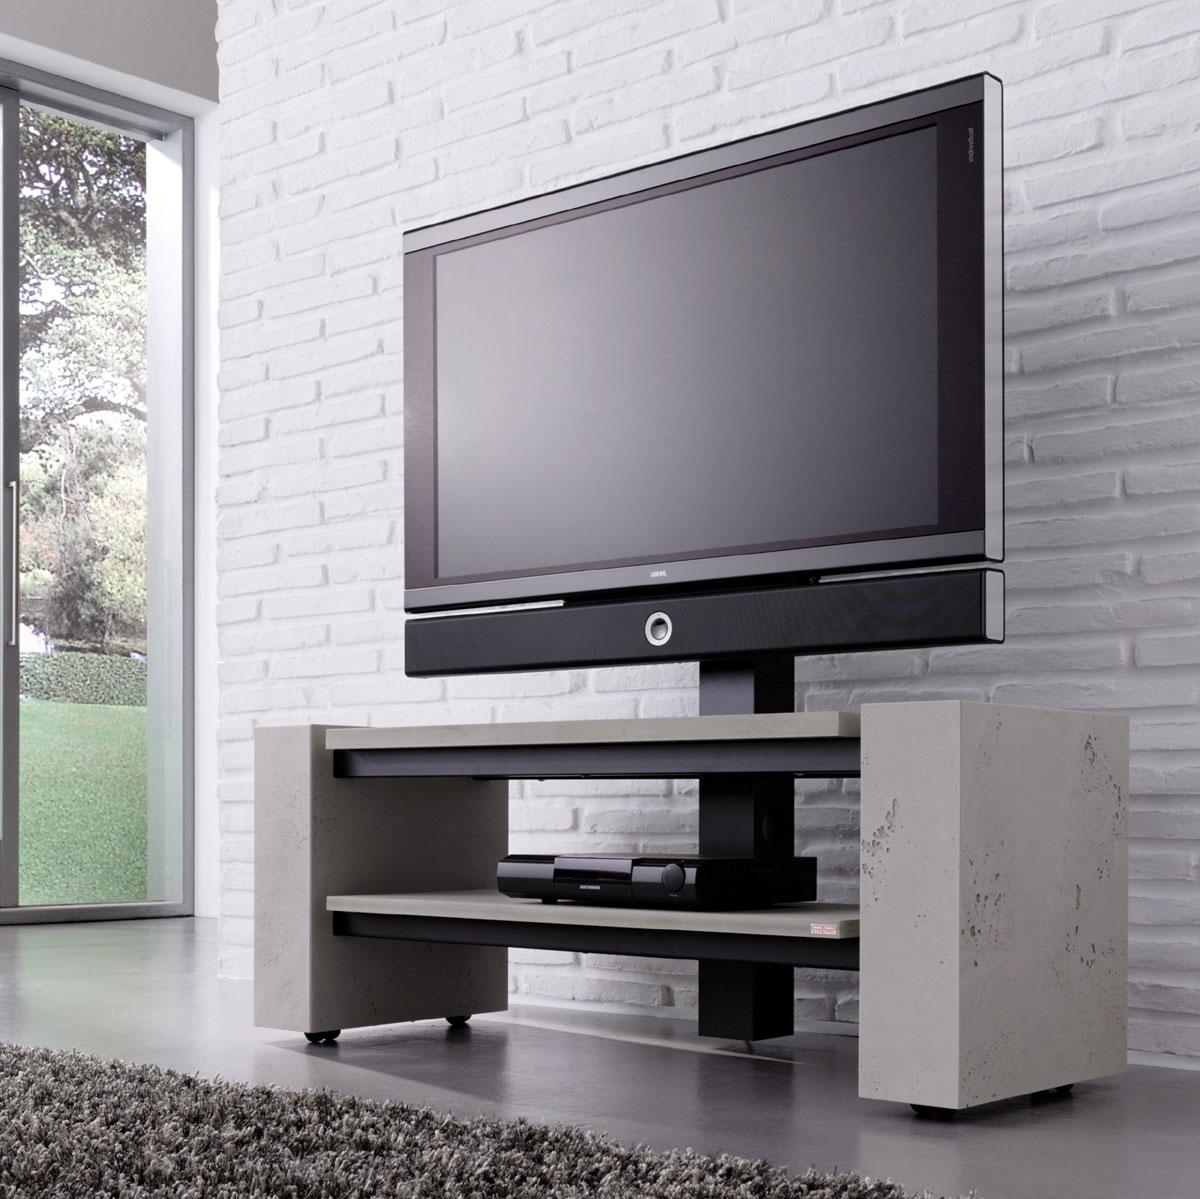 Flatscreenhalterung Archive TV Mbel Und Hifi Mbel Guide